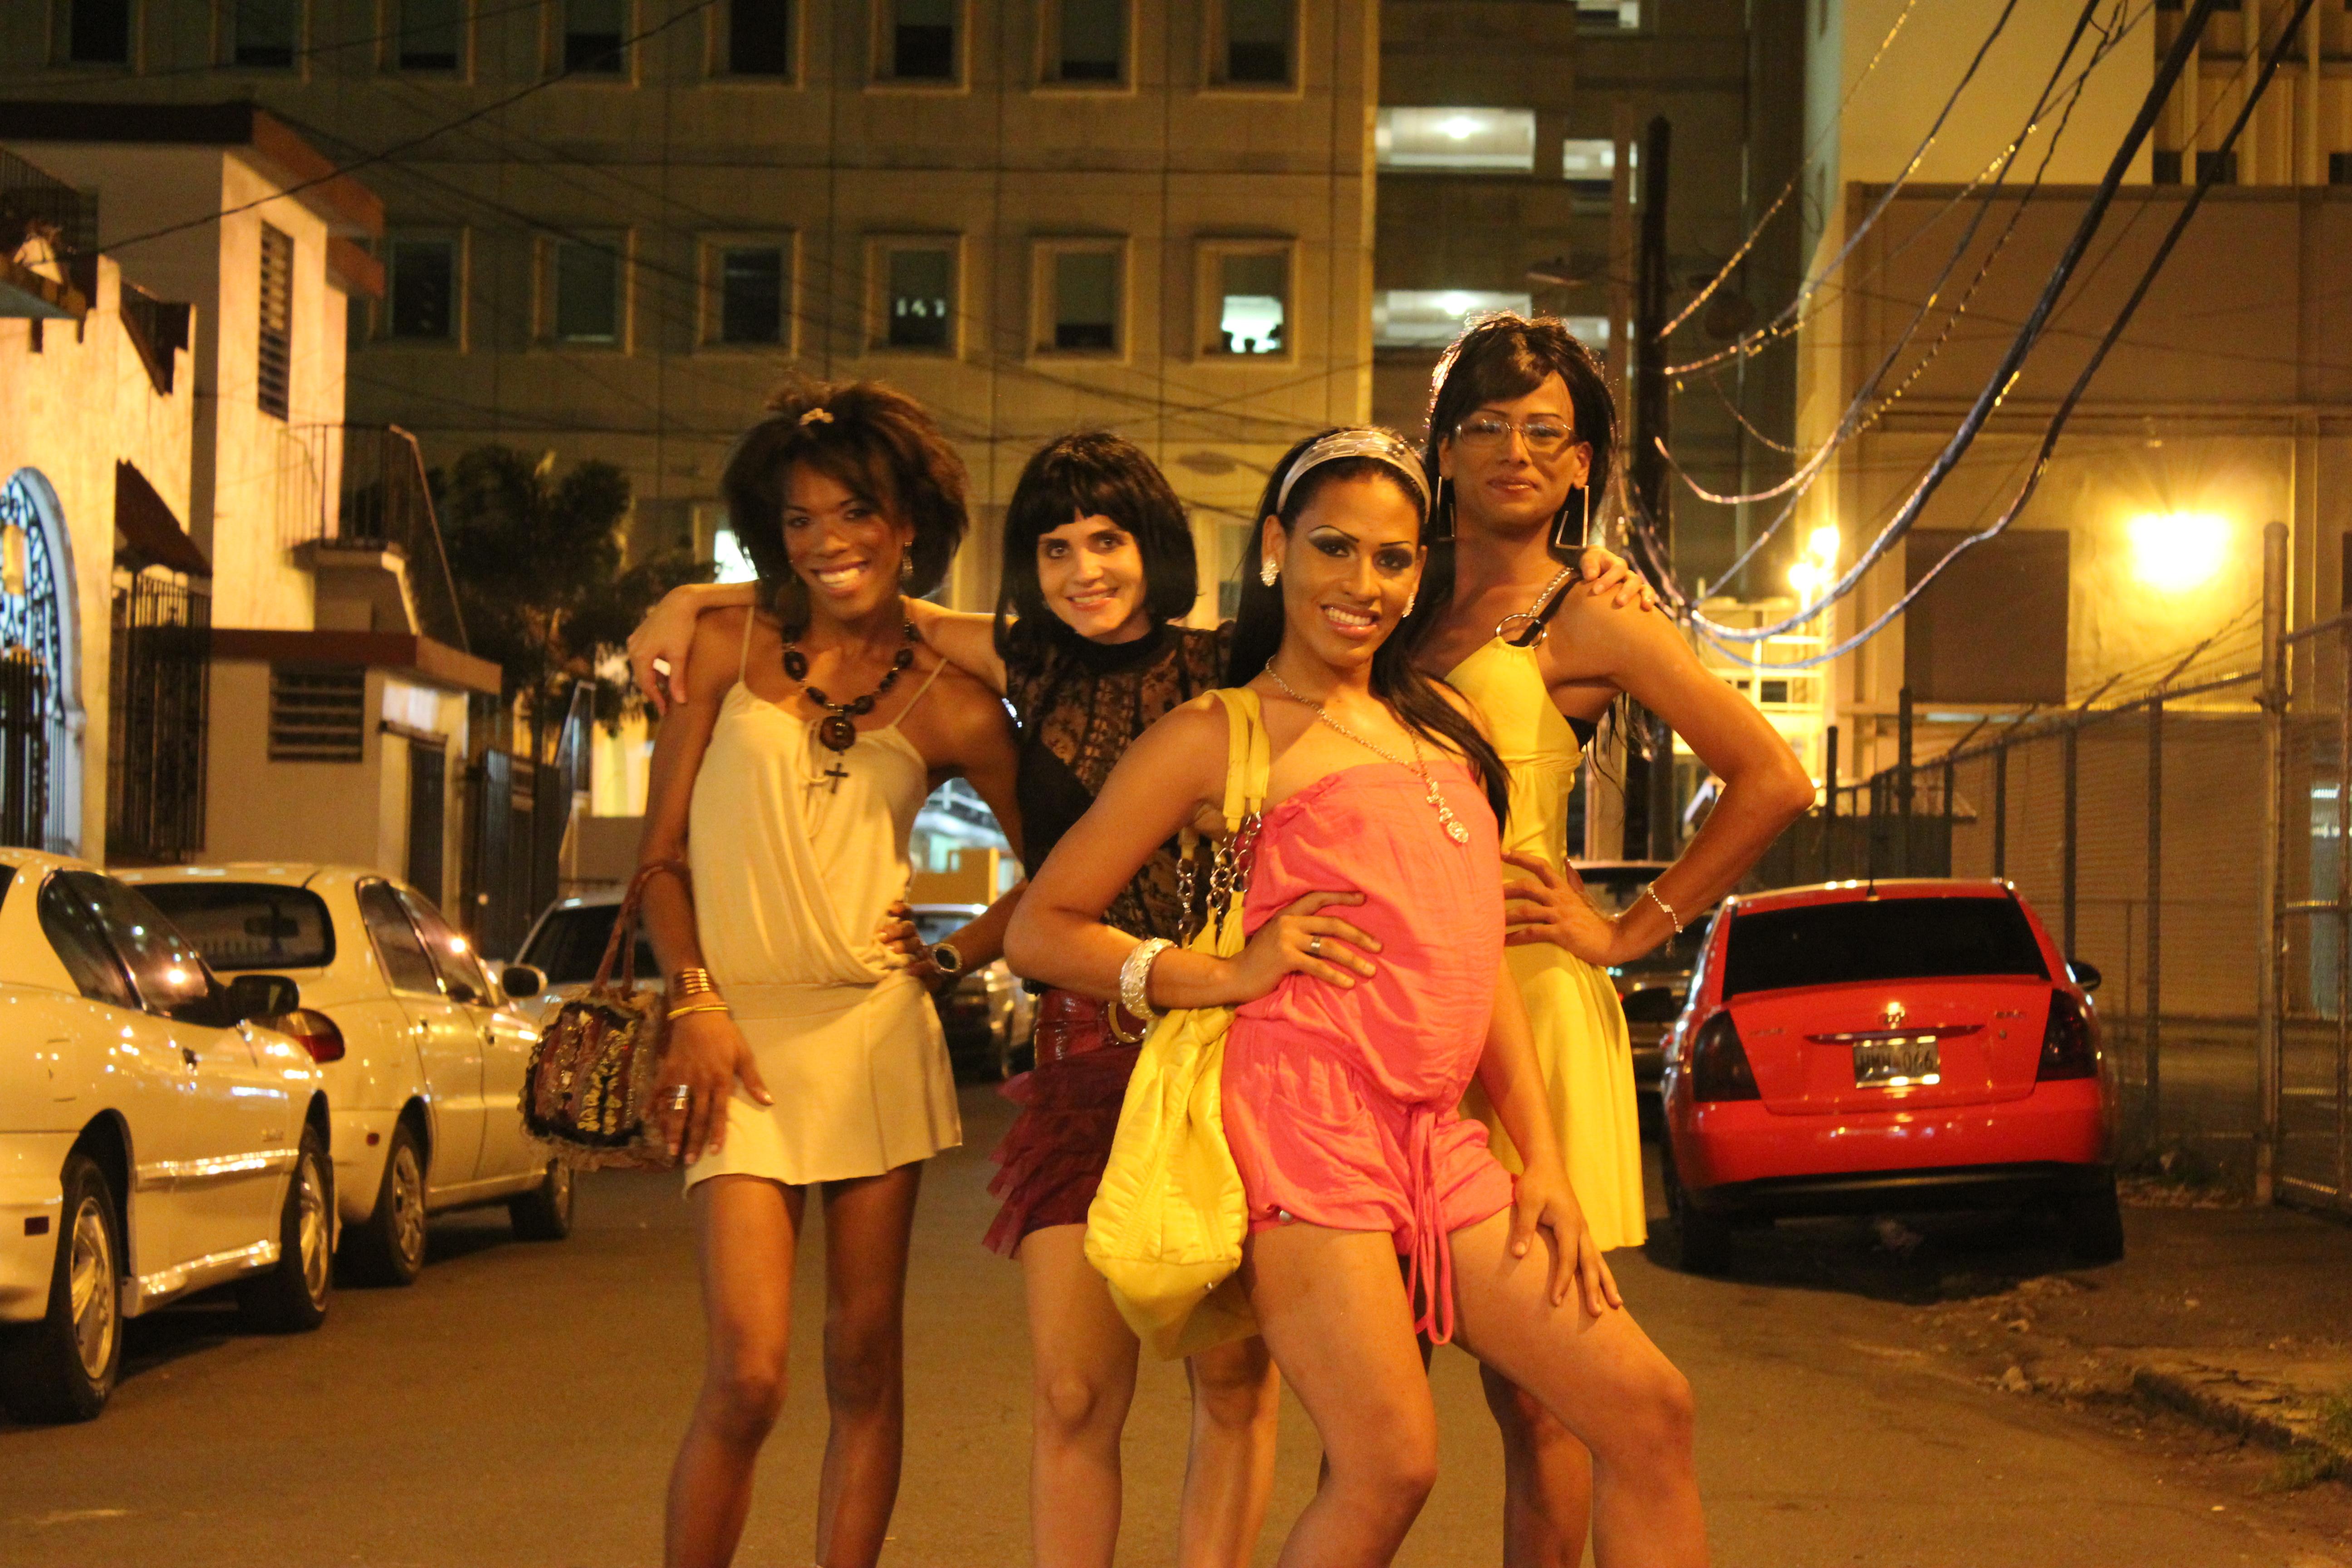 prostitutas en jerez de la frontera prostitutas adolescentes